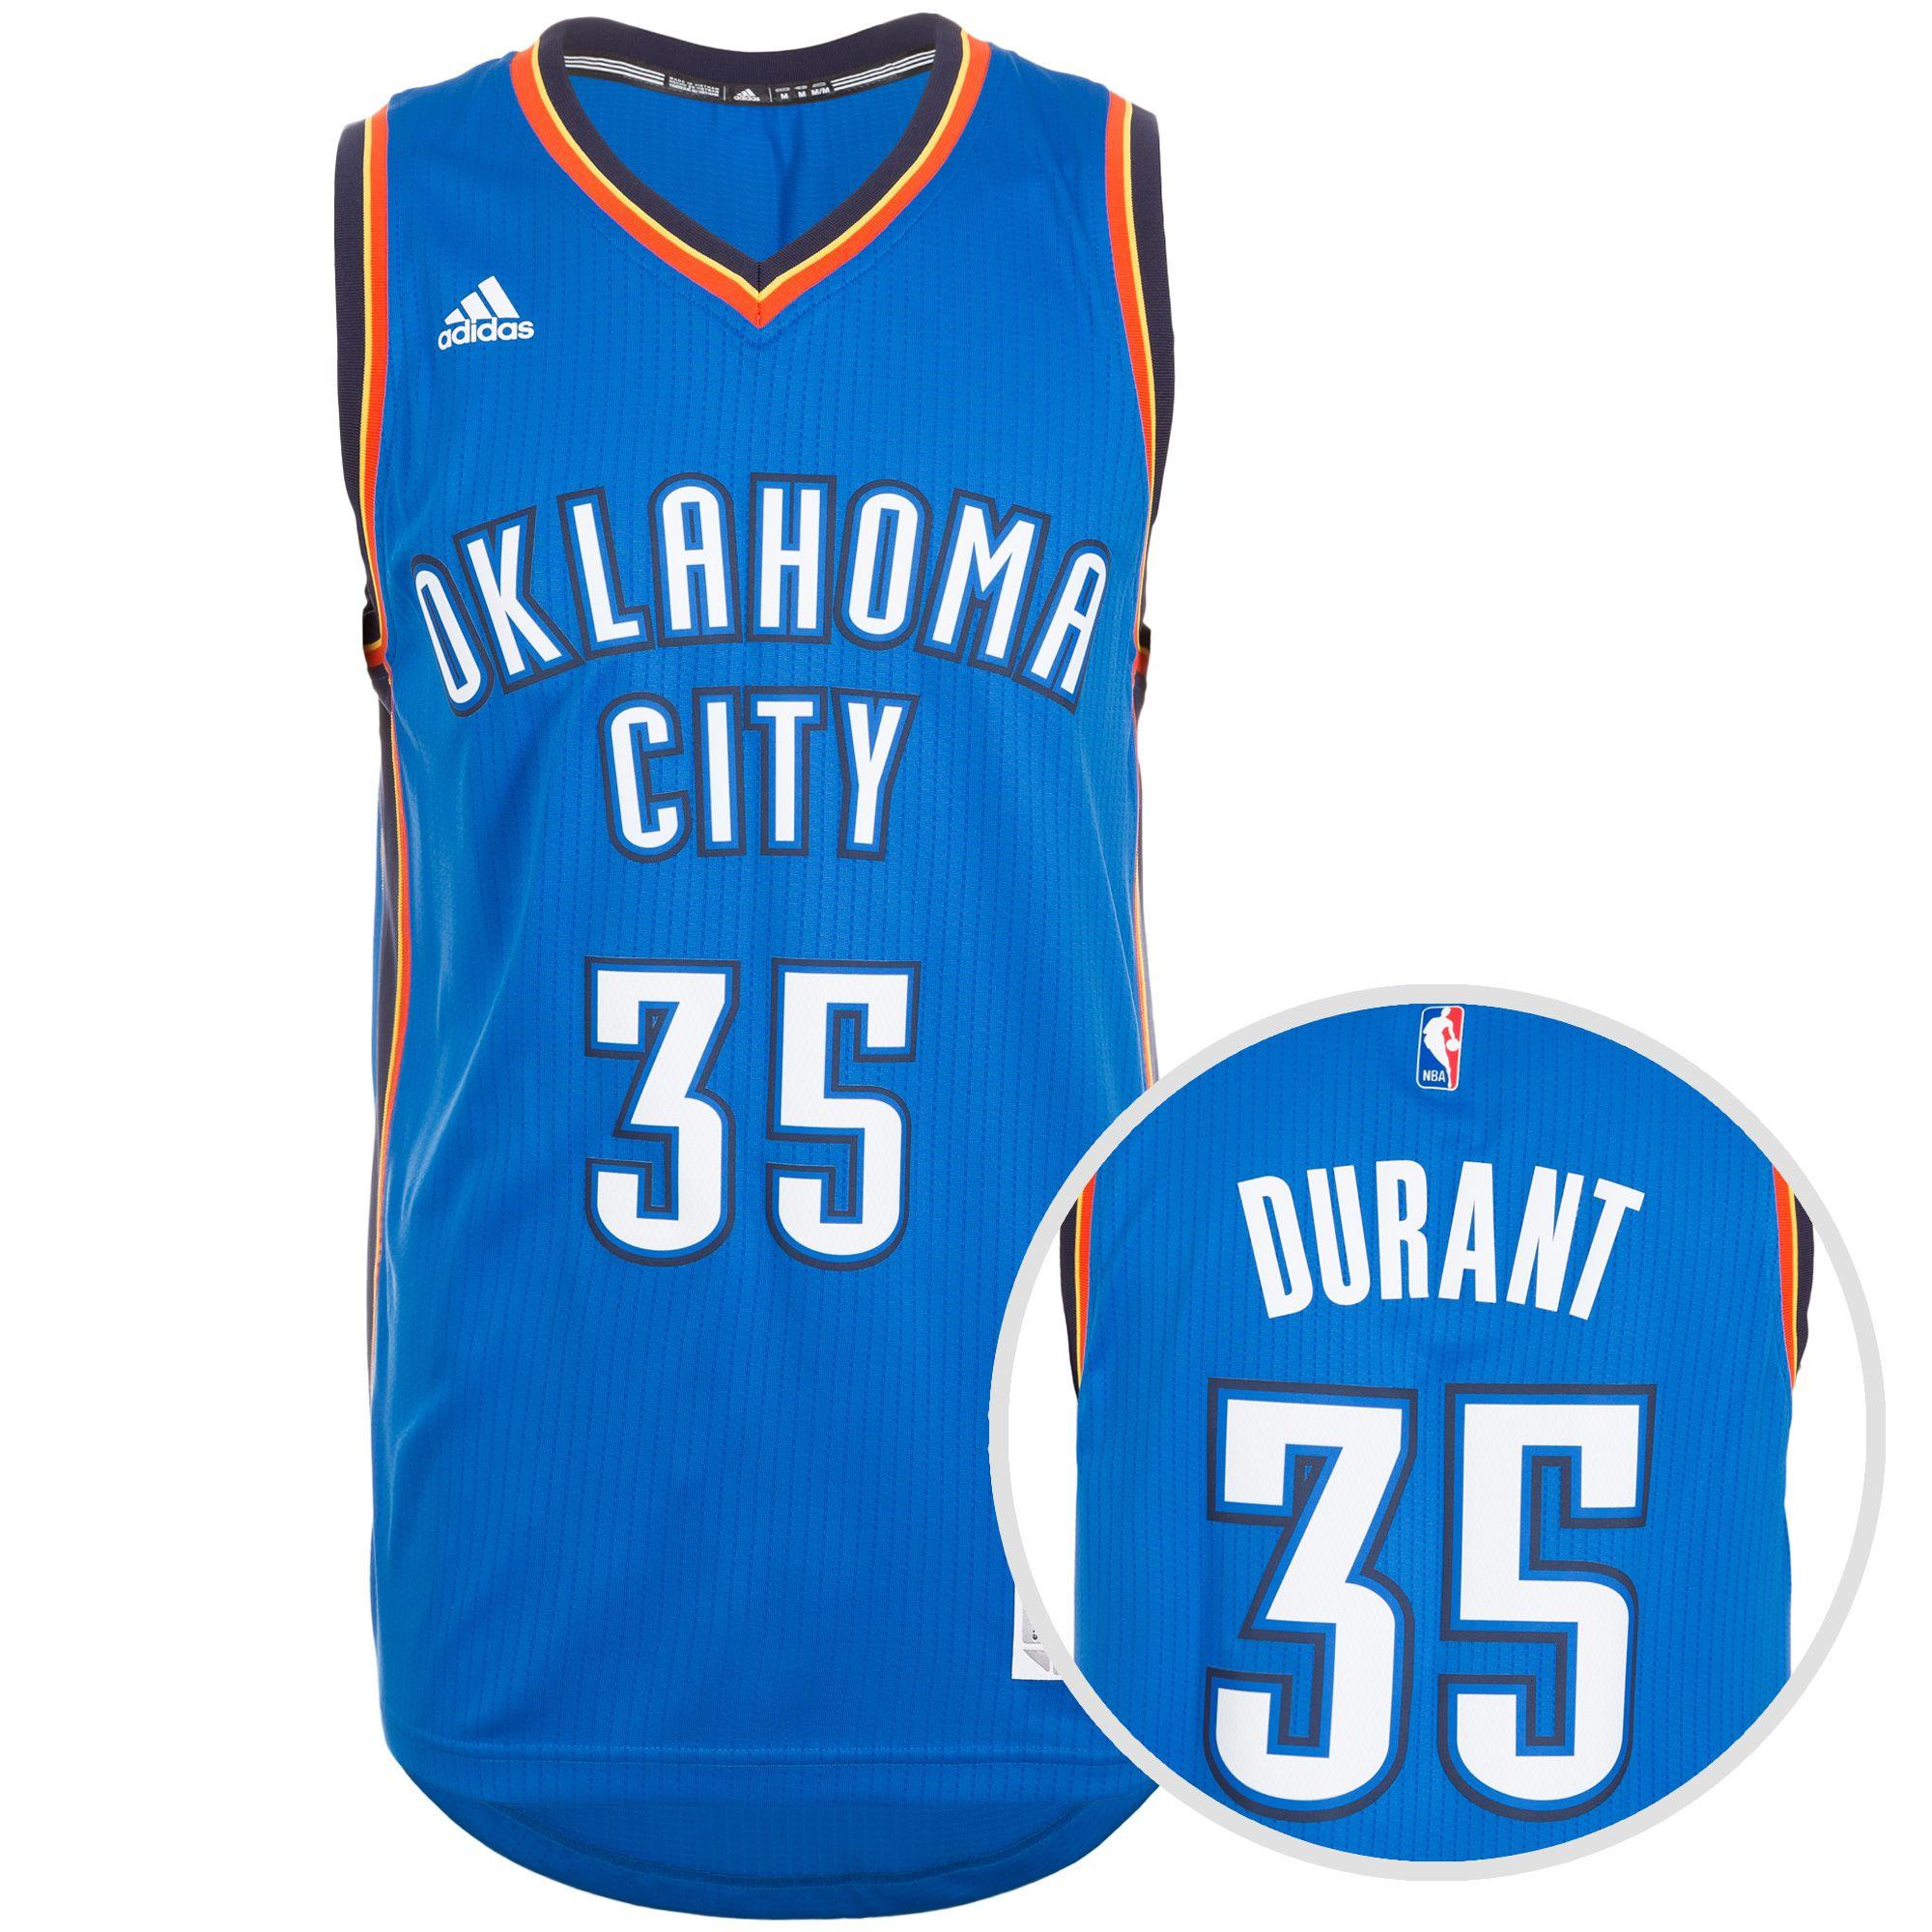 ADIDAS PERFORMANCE adidas Performance Oklahoma City Thunder Durant Swingman Basketballtrikot Herren